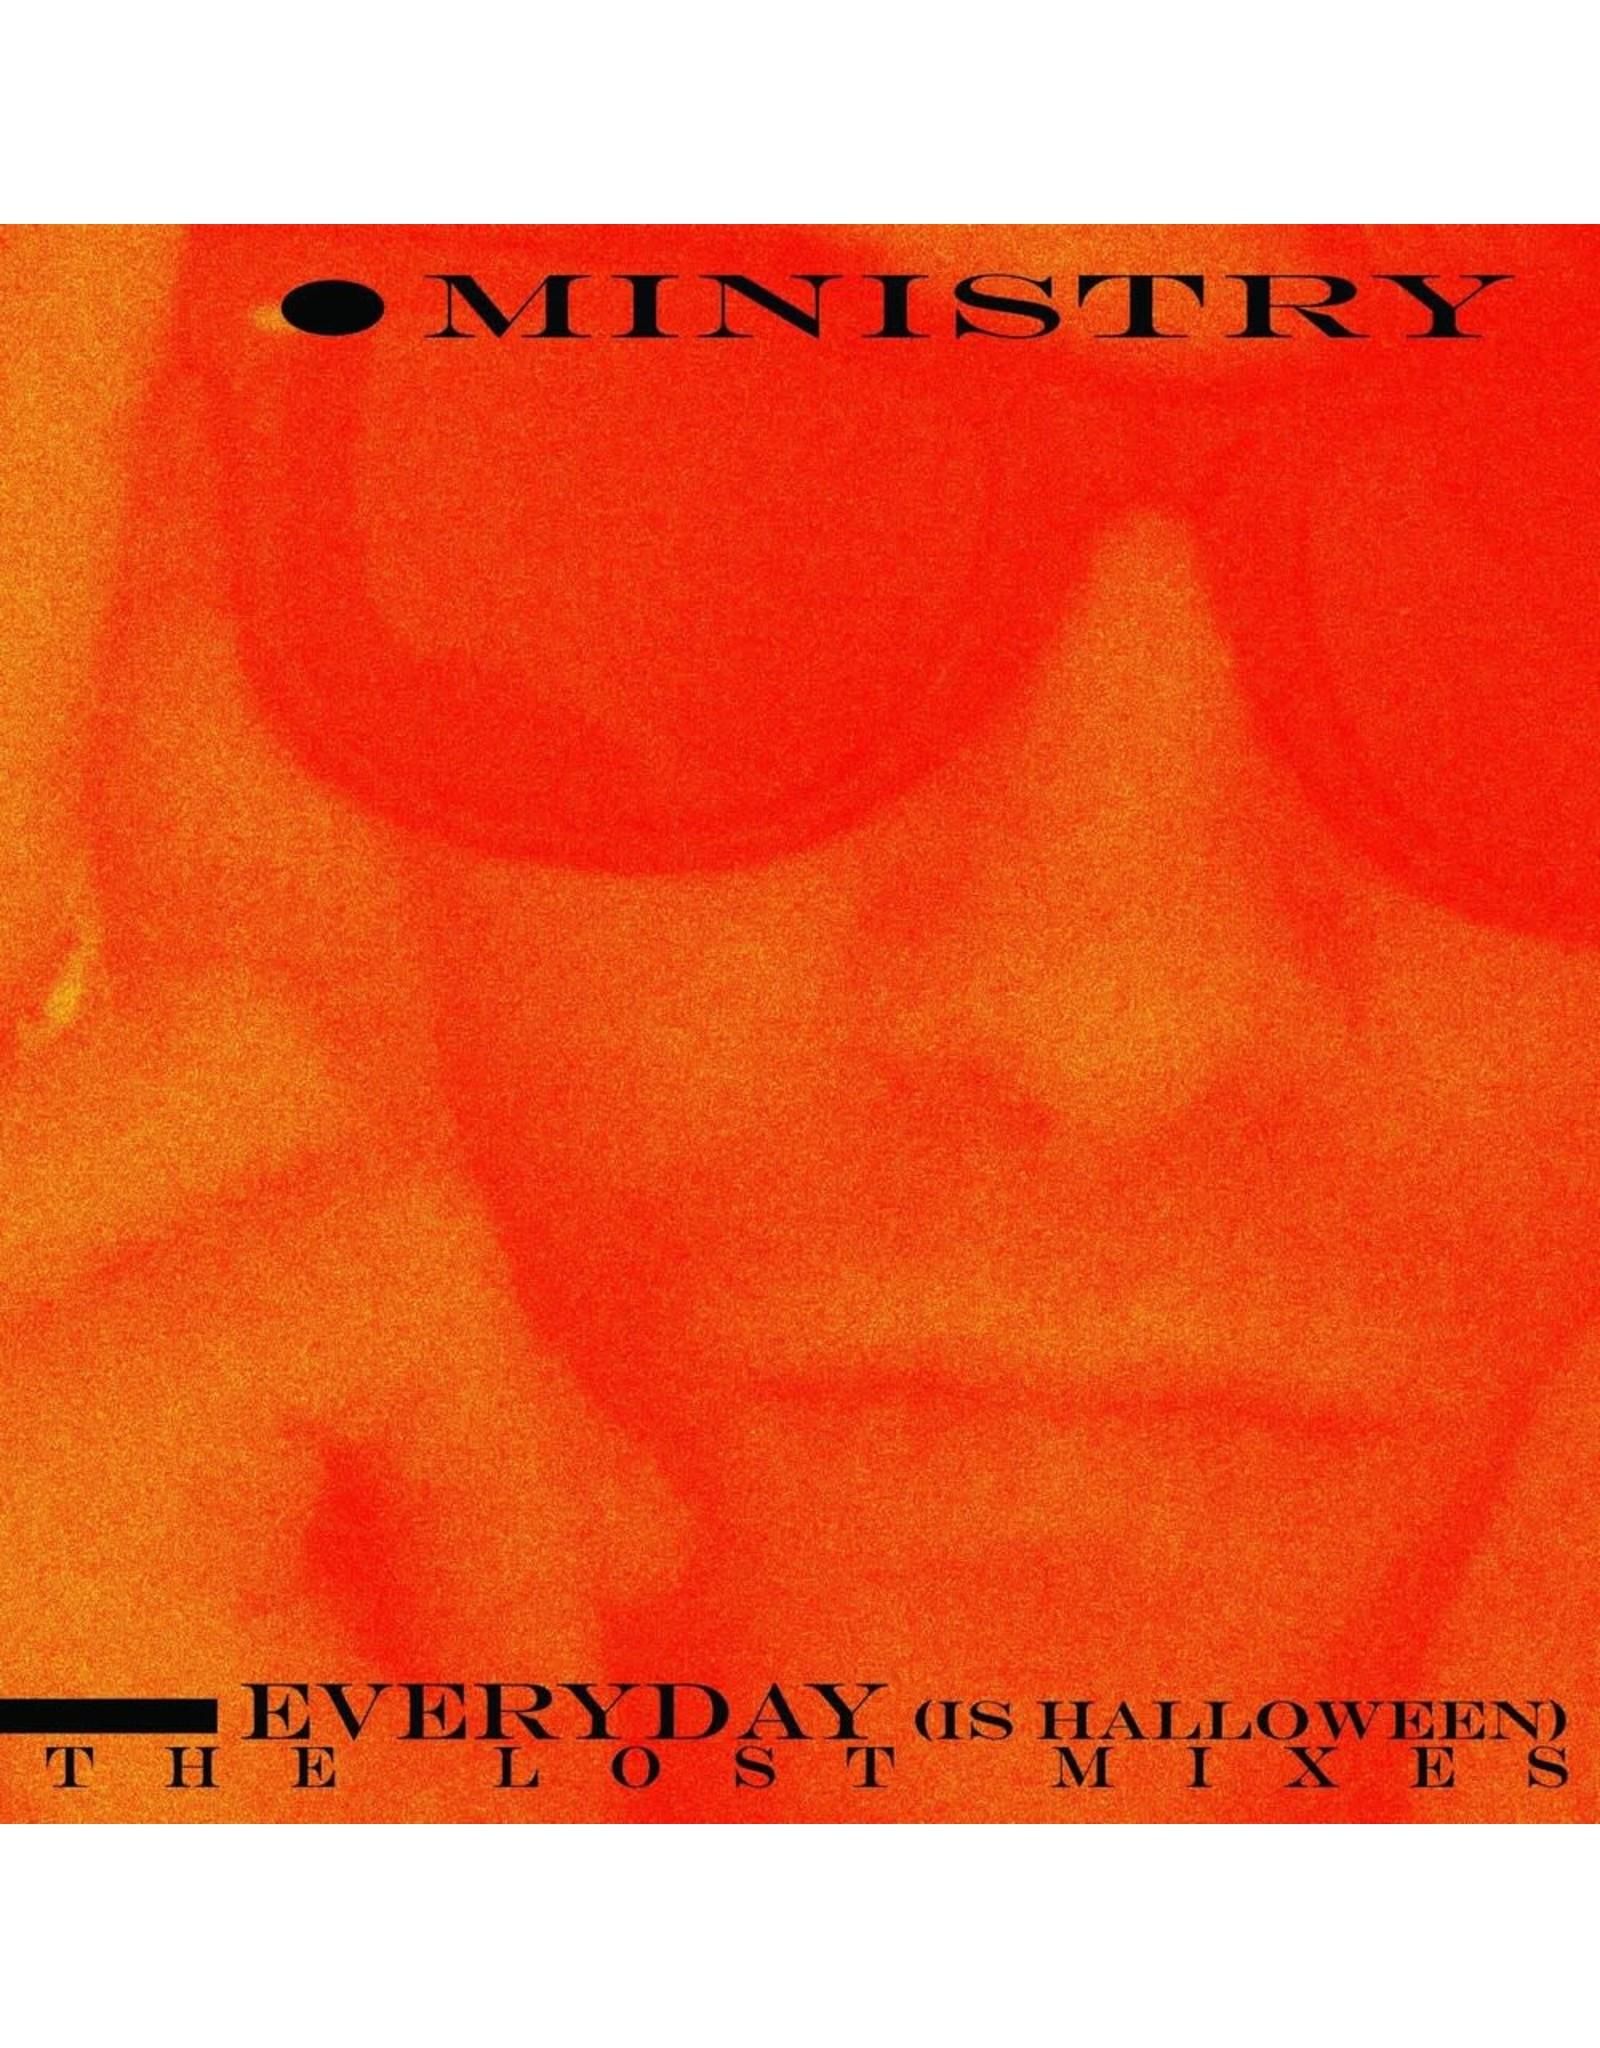 Ministry - Everyday (Is Halloween): The Lost Mixes (Orange Vinyl) LP